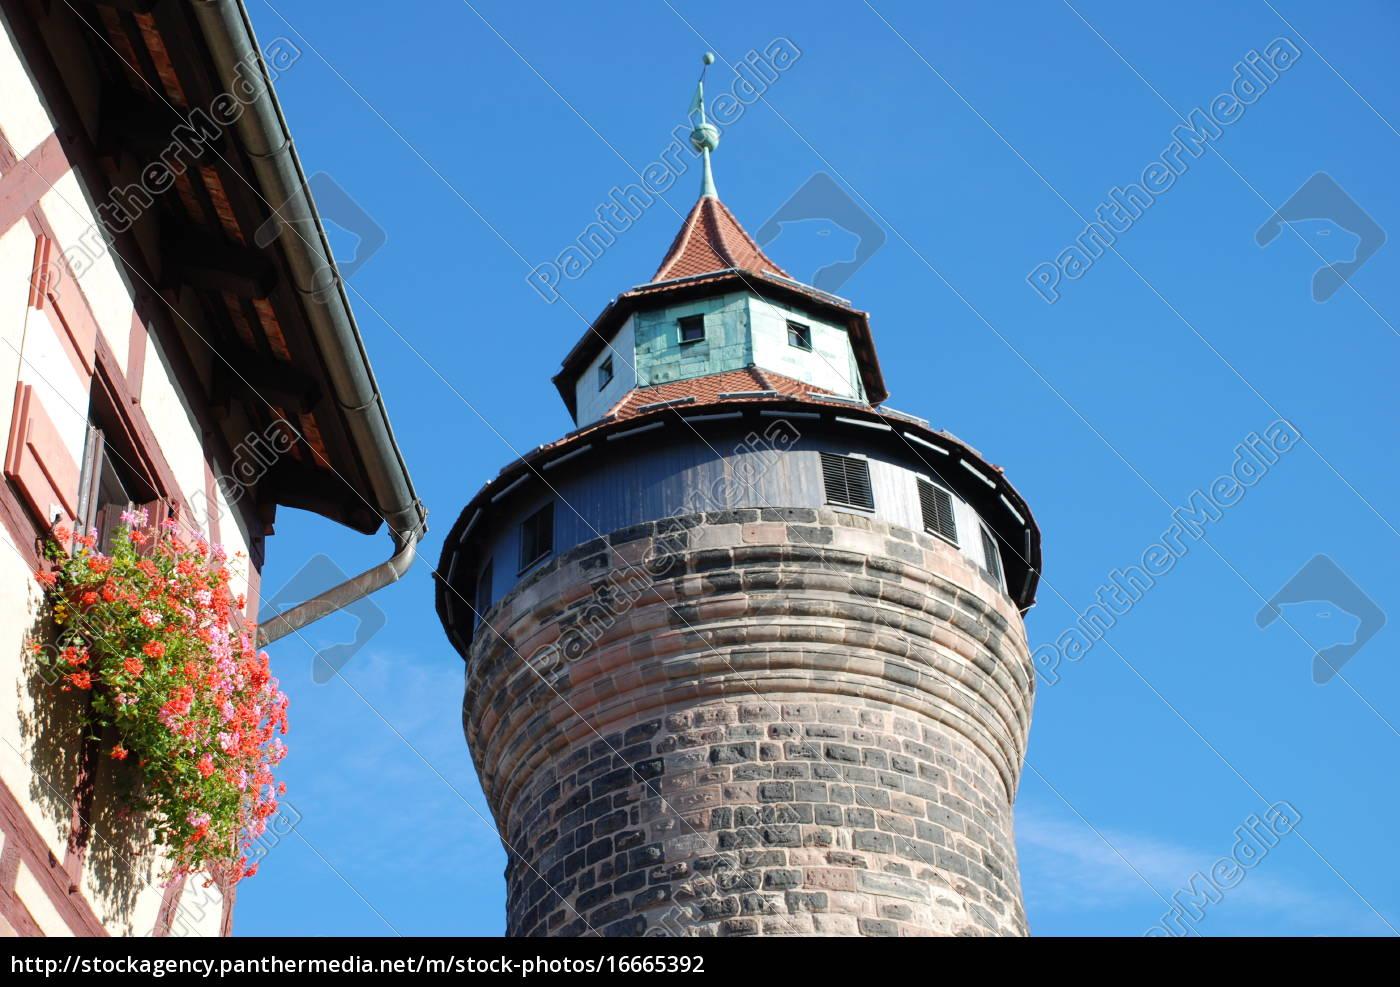 norimberga, castello, kaiserburg, wehrgang, sinwelltower, deep - 16665392